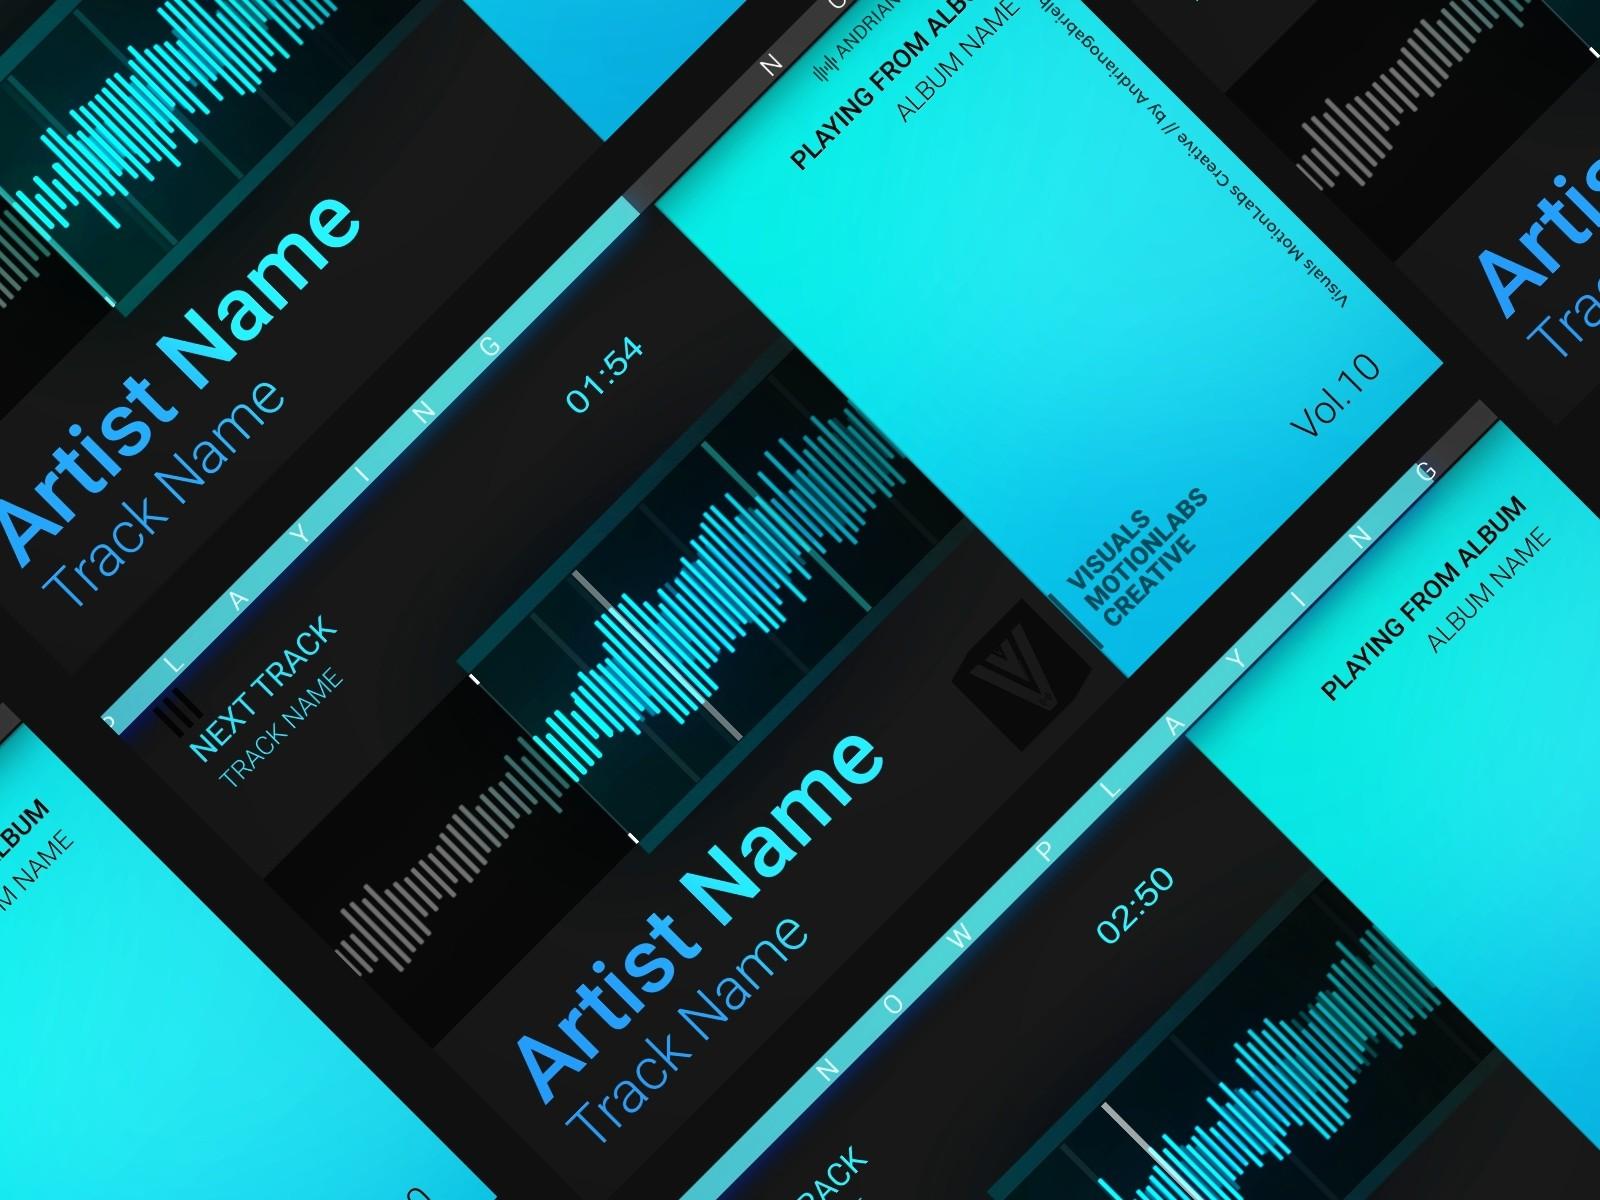 Audio Spectrum / Music Visualizer Concept S10 (Waveform Digital) by Gabriel  Andriano B  (Andrianogabrielb)